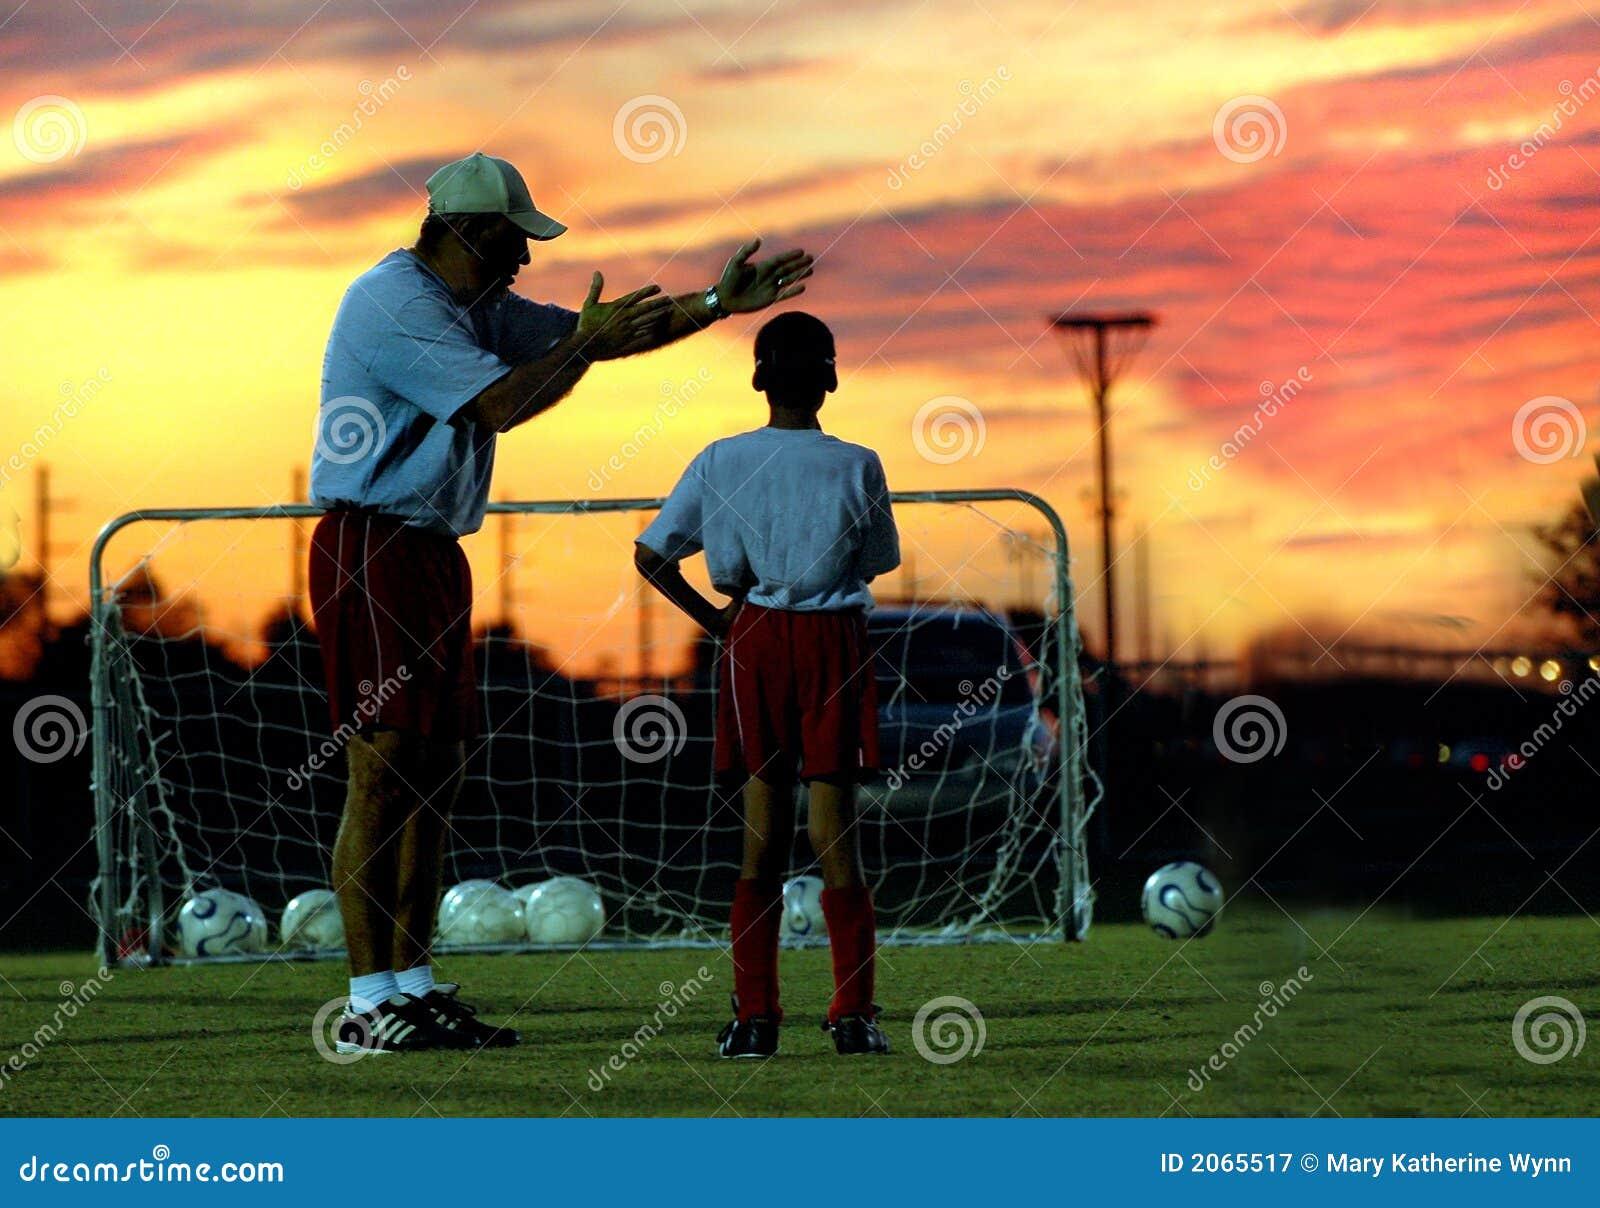 Fußball, der am Sonnenuntergang trainiert